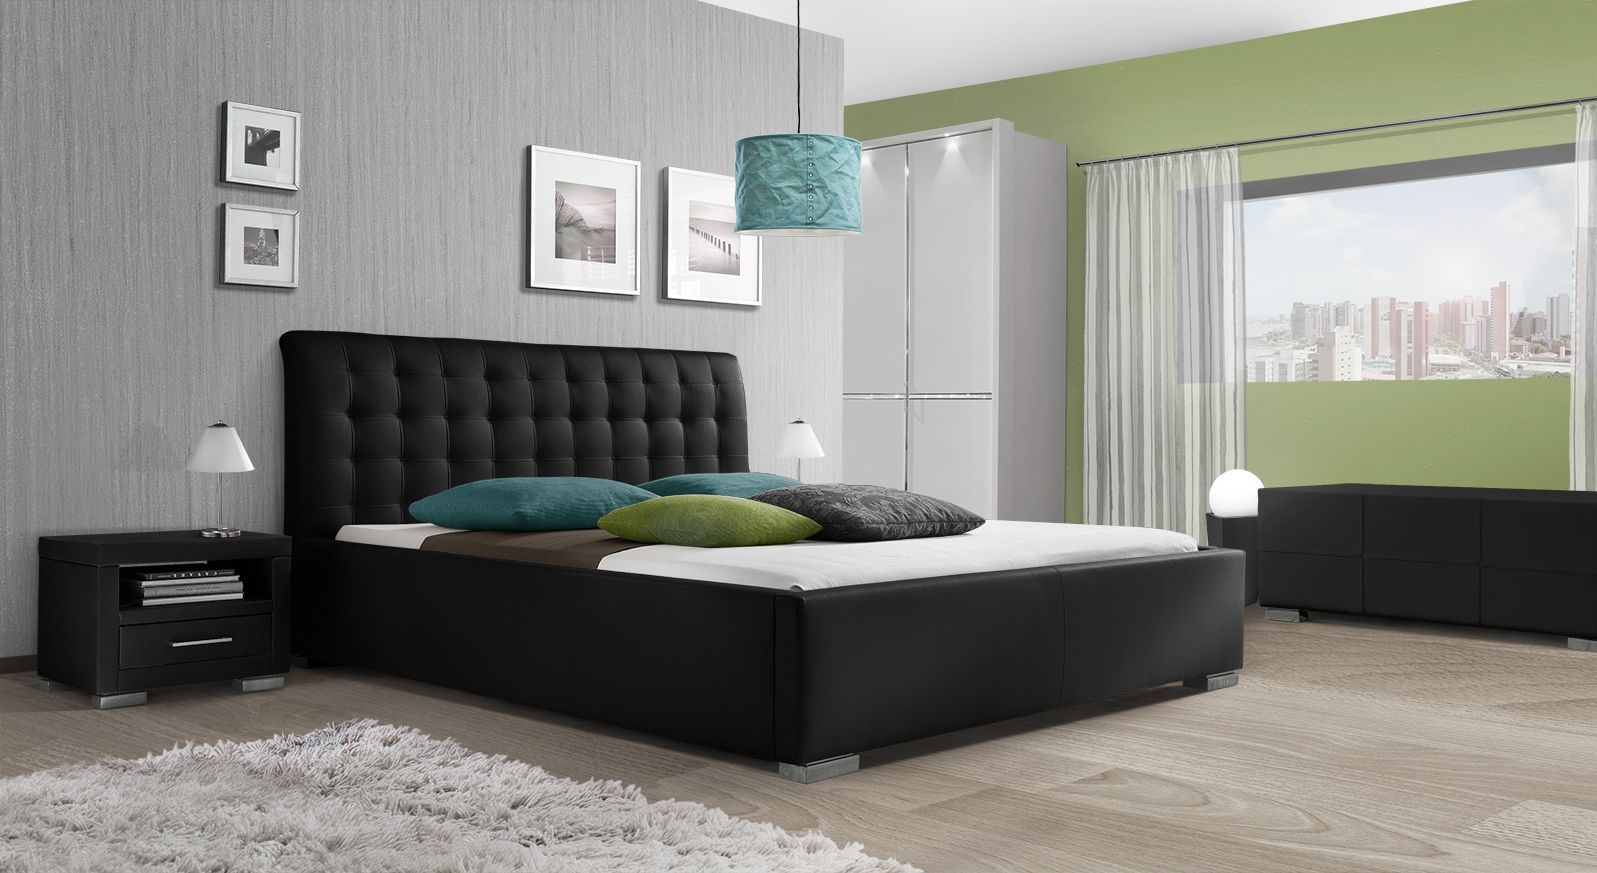 Kunstlederbett Baskerville Comfort mit passenden Produkten